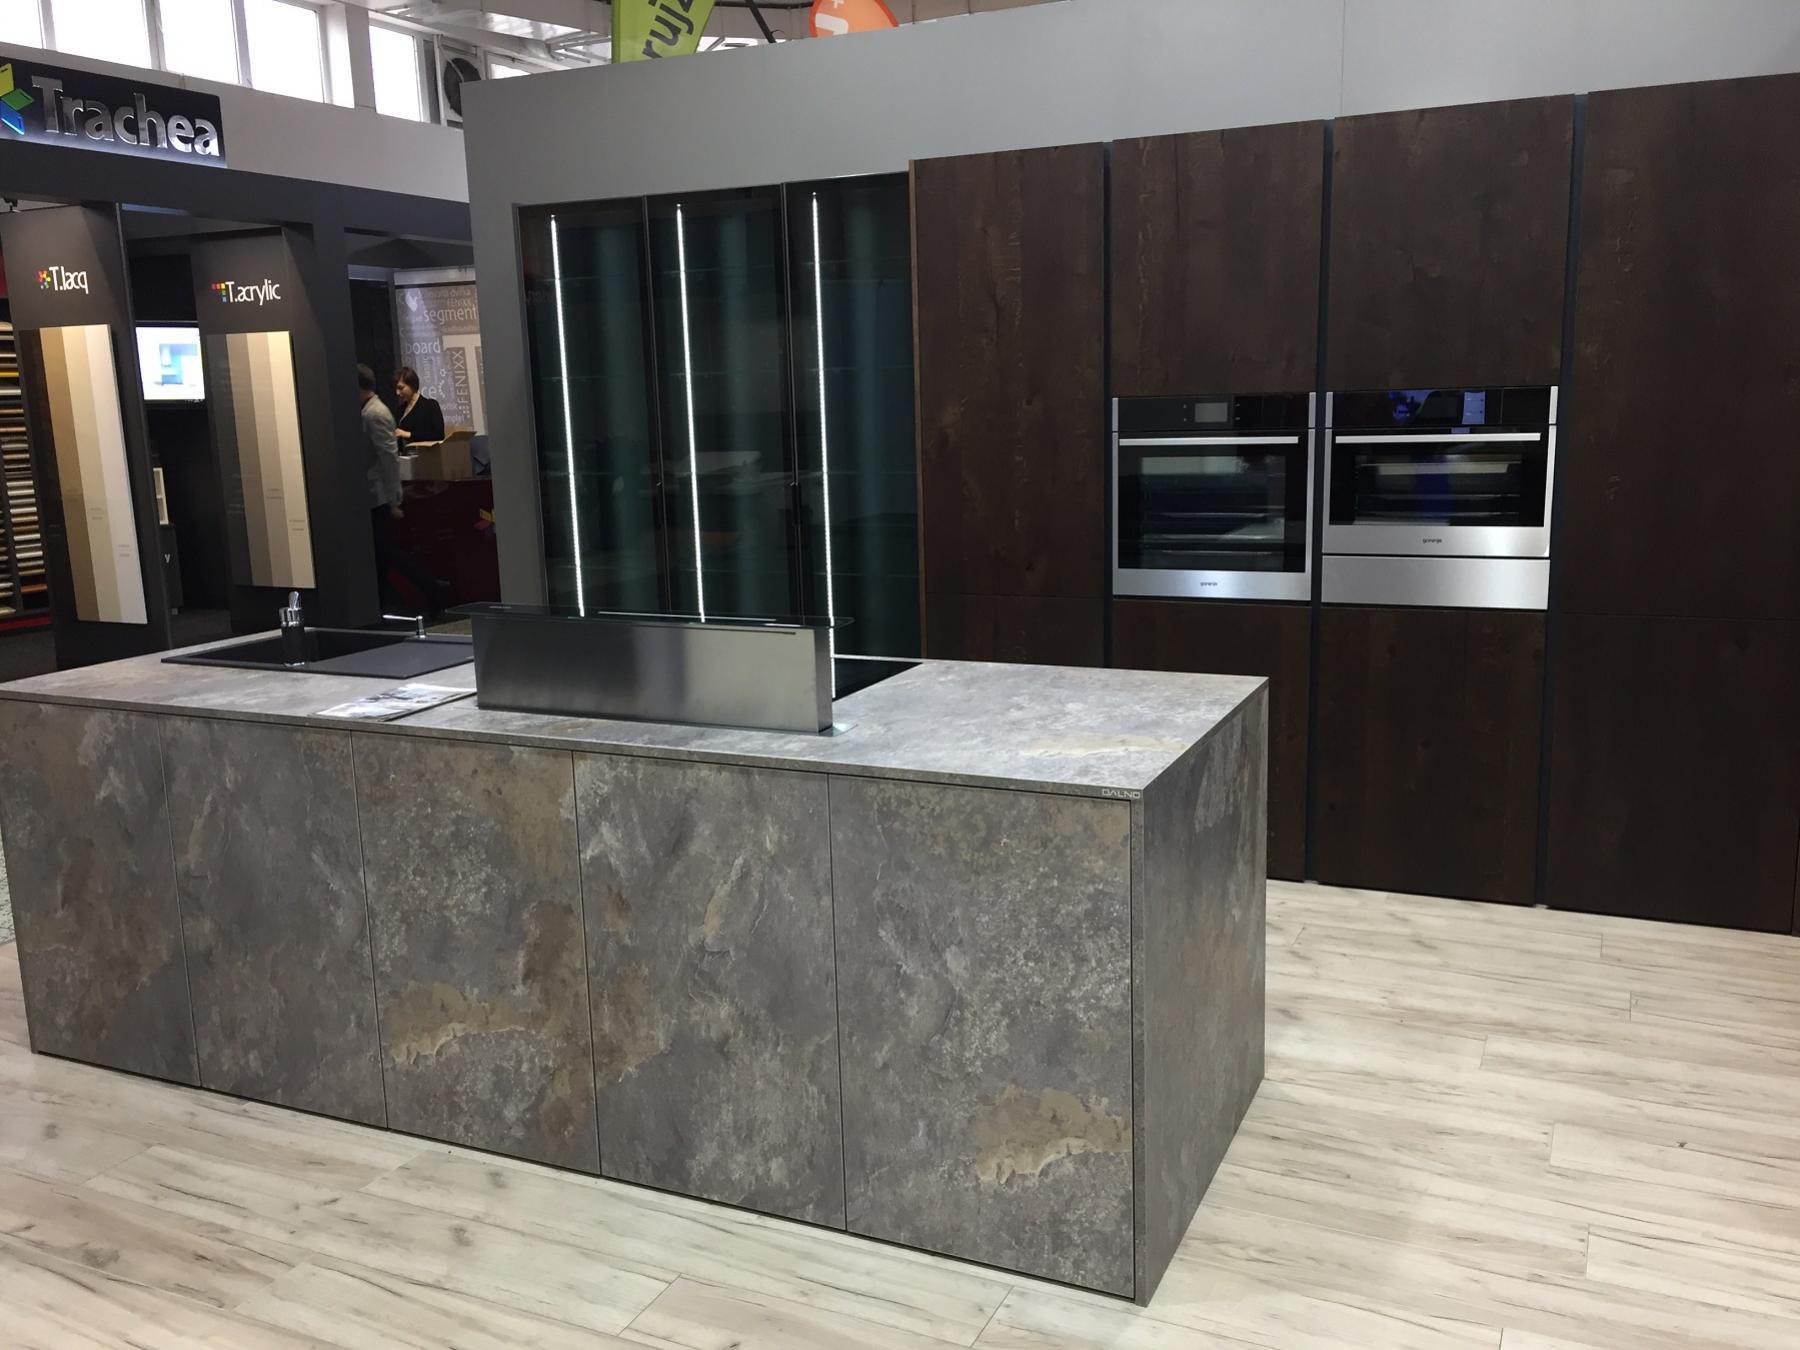 Frozen Elektro kuchynsk� linky a spotrebi�e nitra